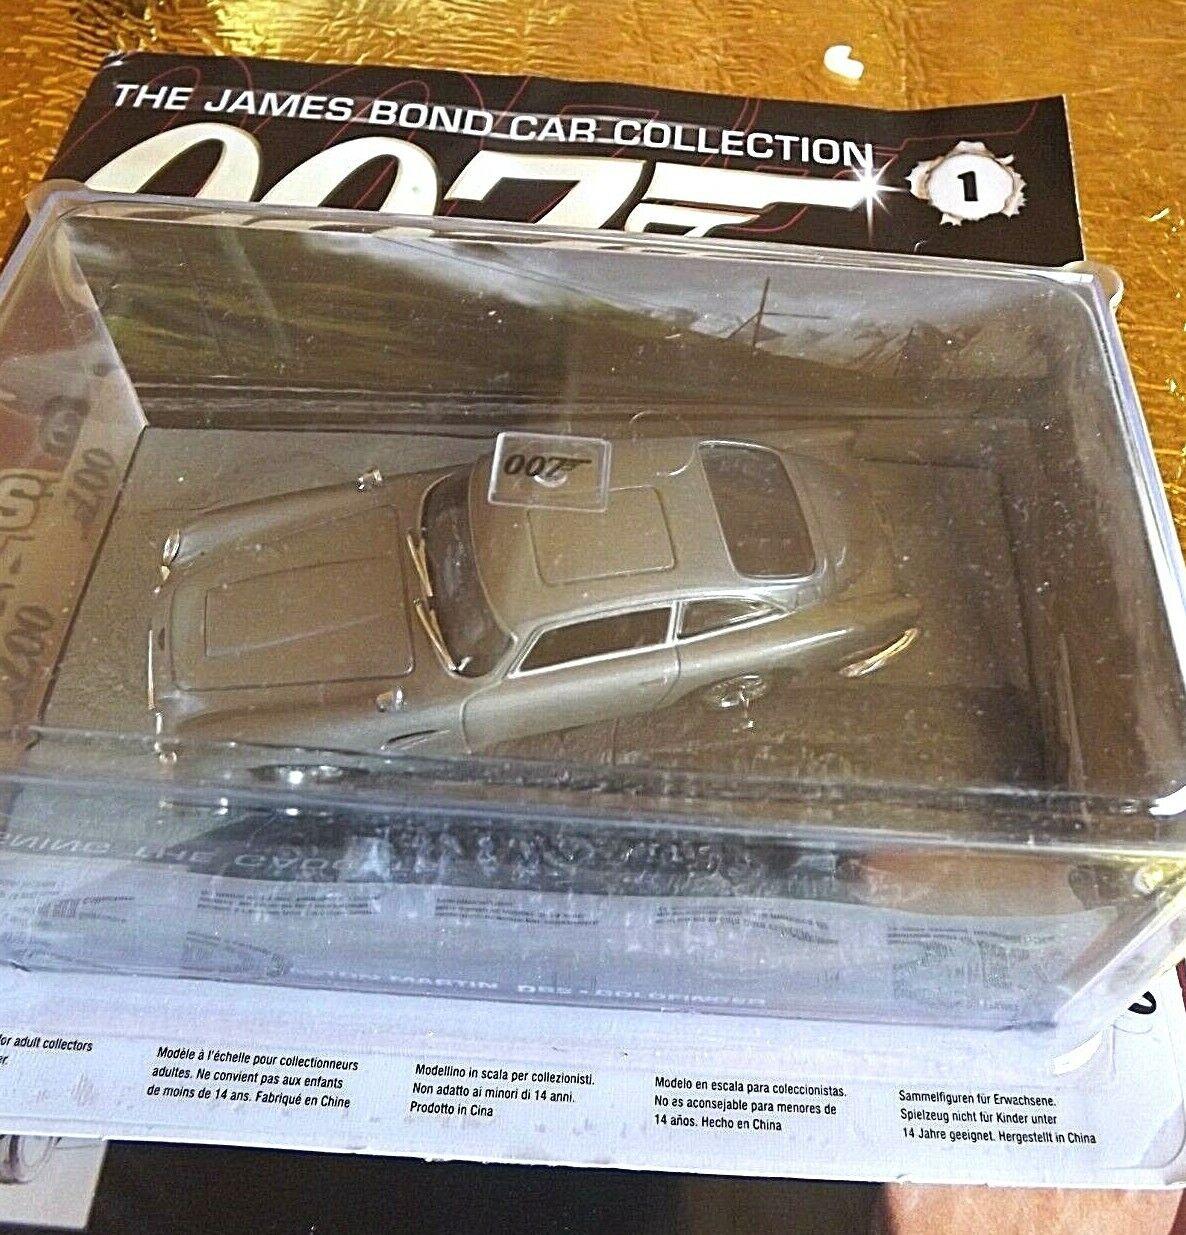 Image of 007 James Bond Car Collection 1 Aston Martin DB5 Model